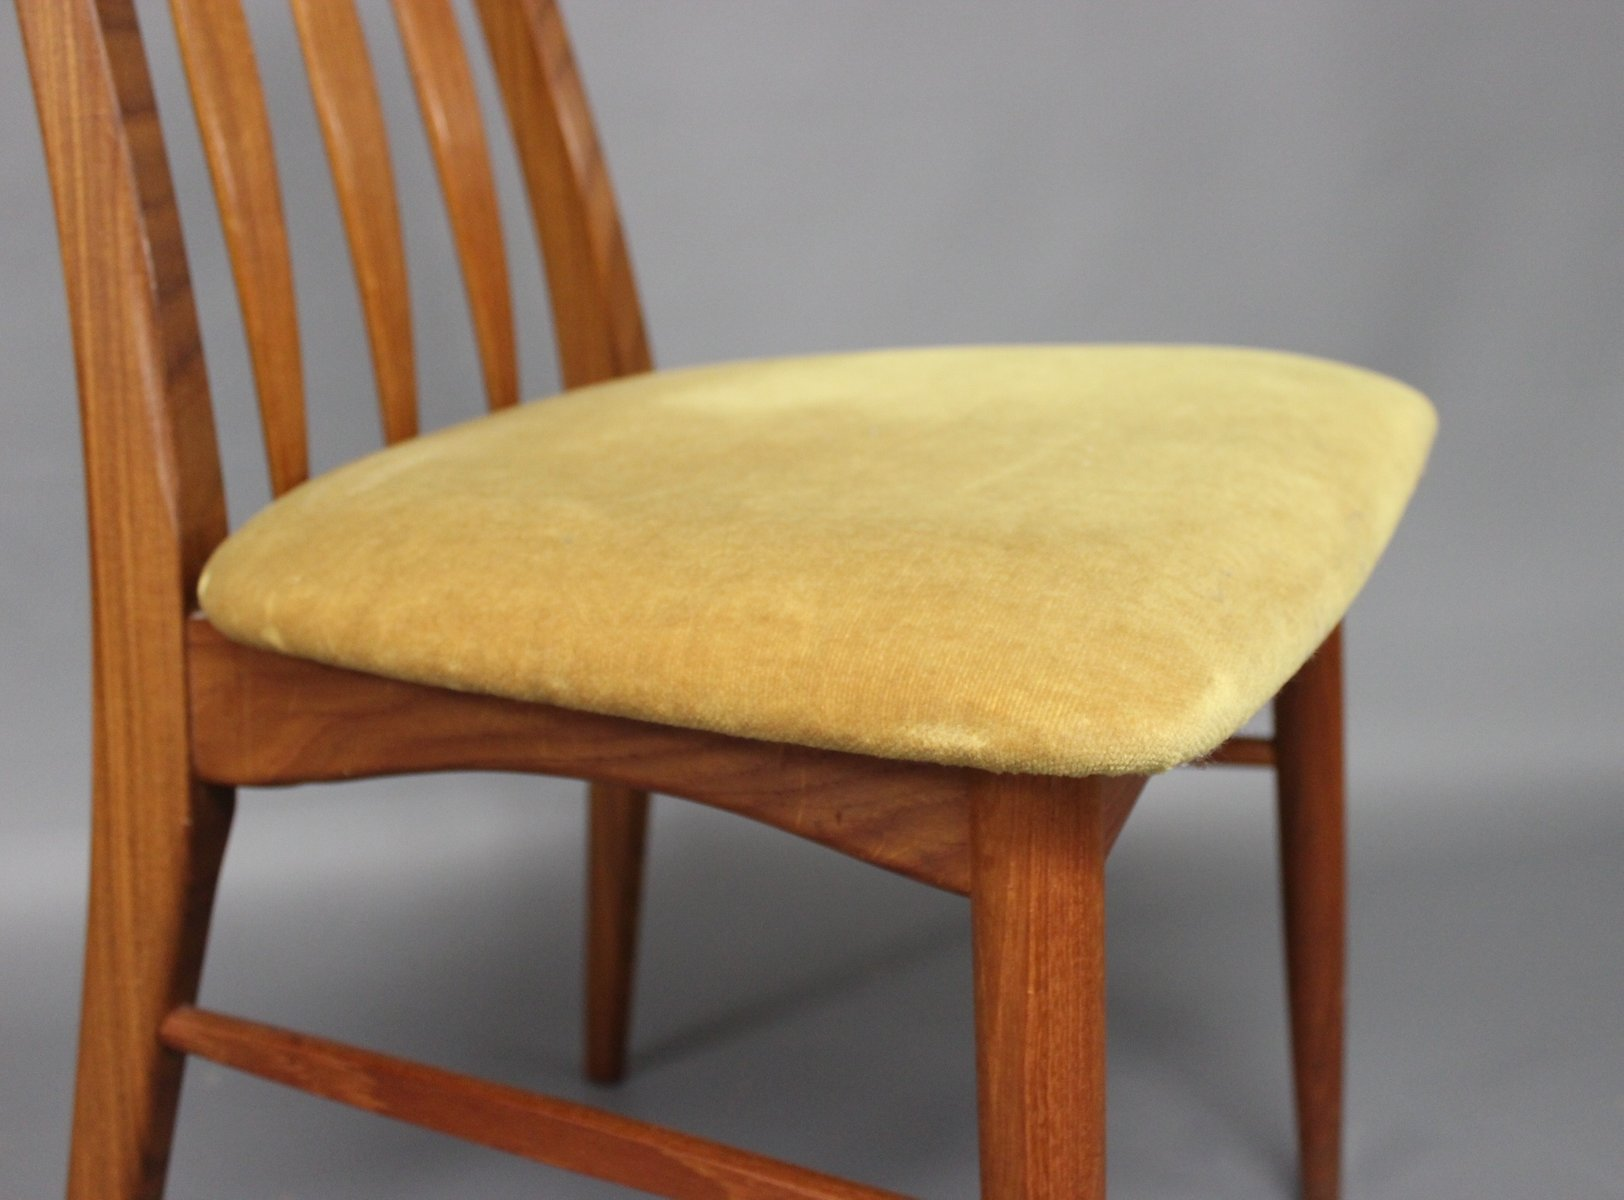 Eva Teak Dining Chairs by Niels Koefoed 1960s Set of 6 for sale